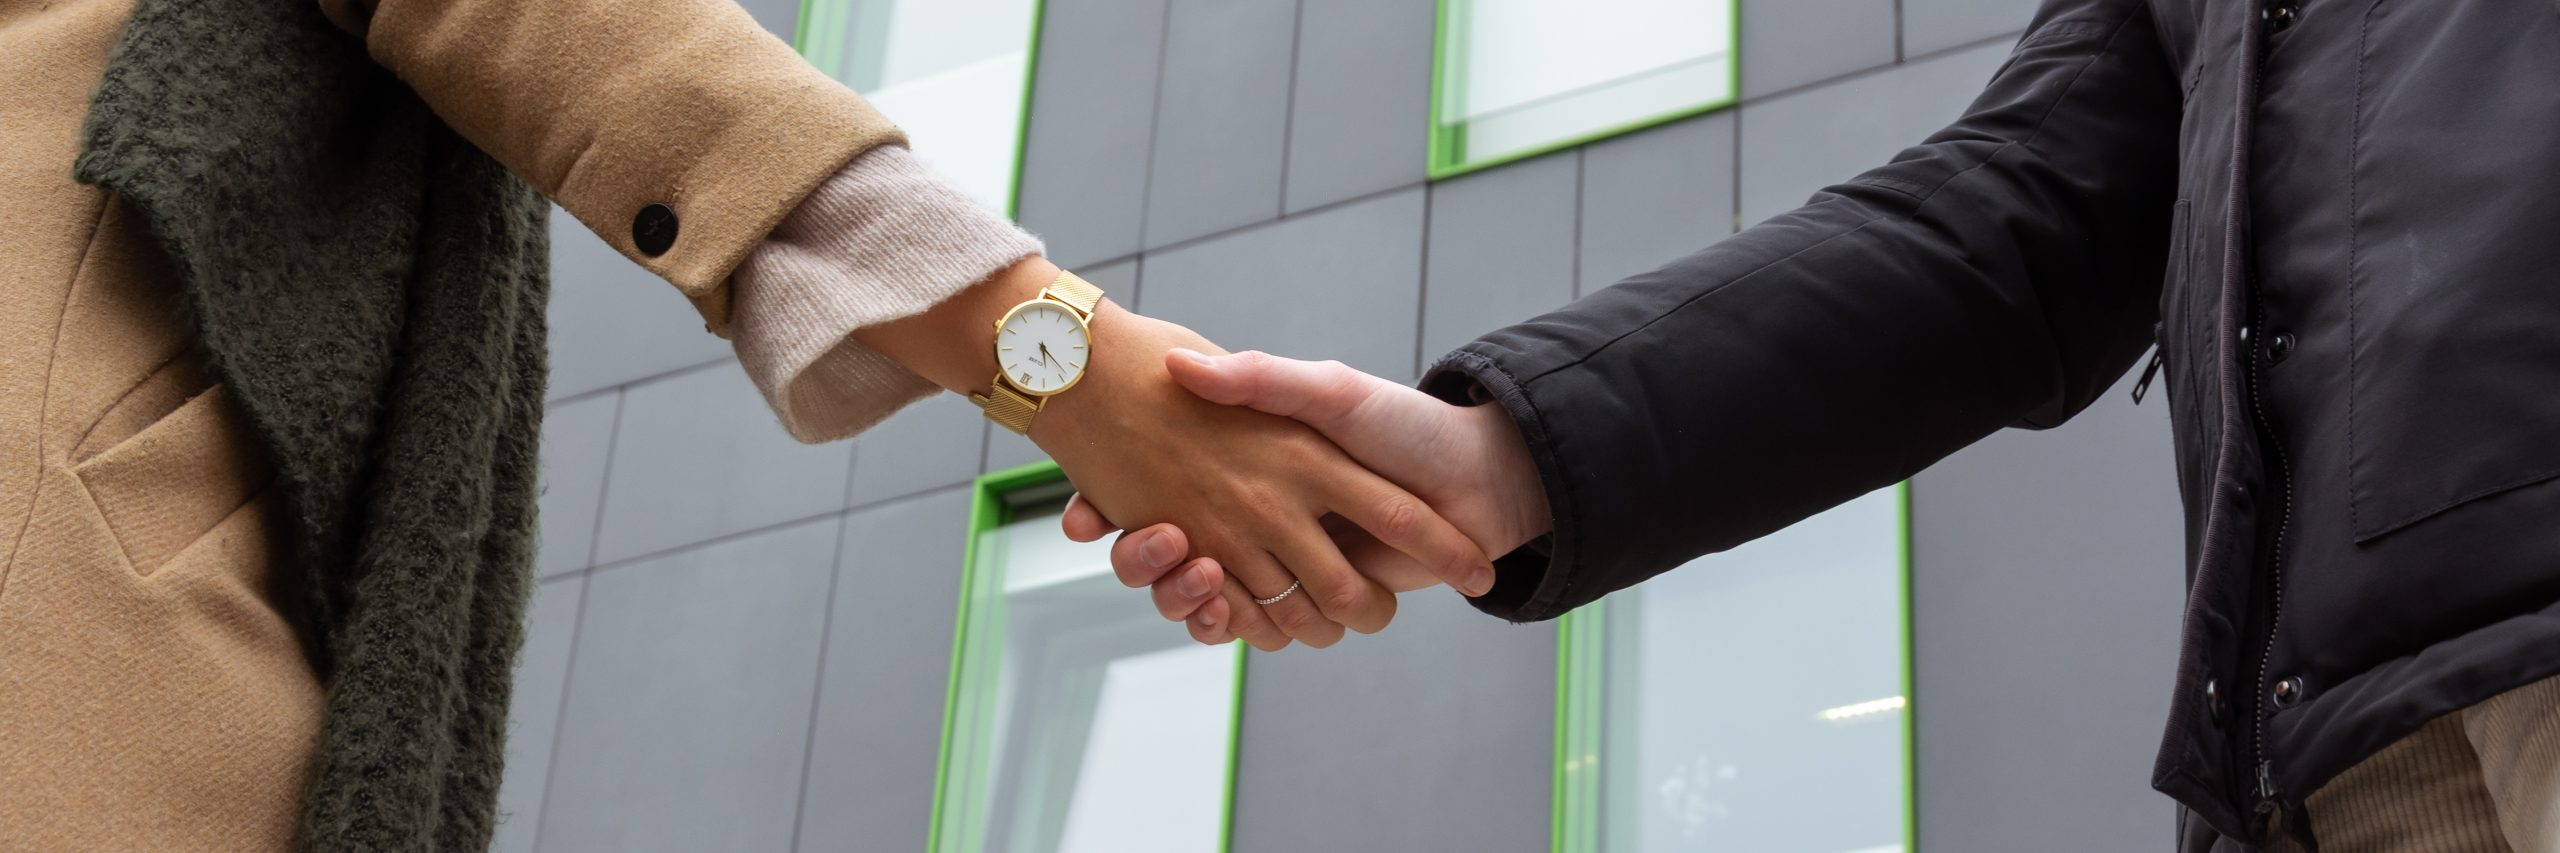 Hände schütteln; Hände; Hochhaus; Bürogebäude; Corporate Social Responsibility